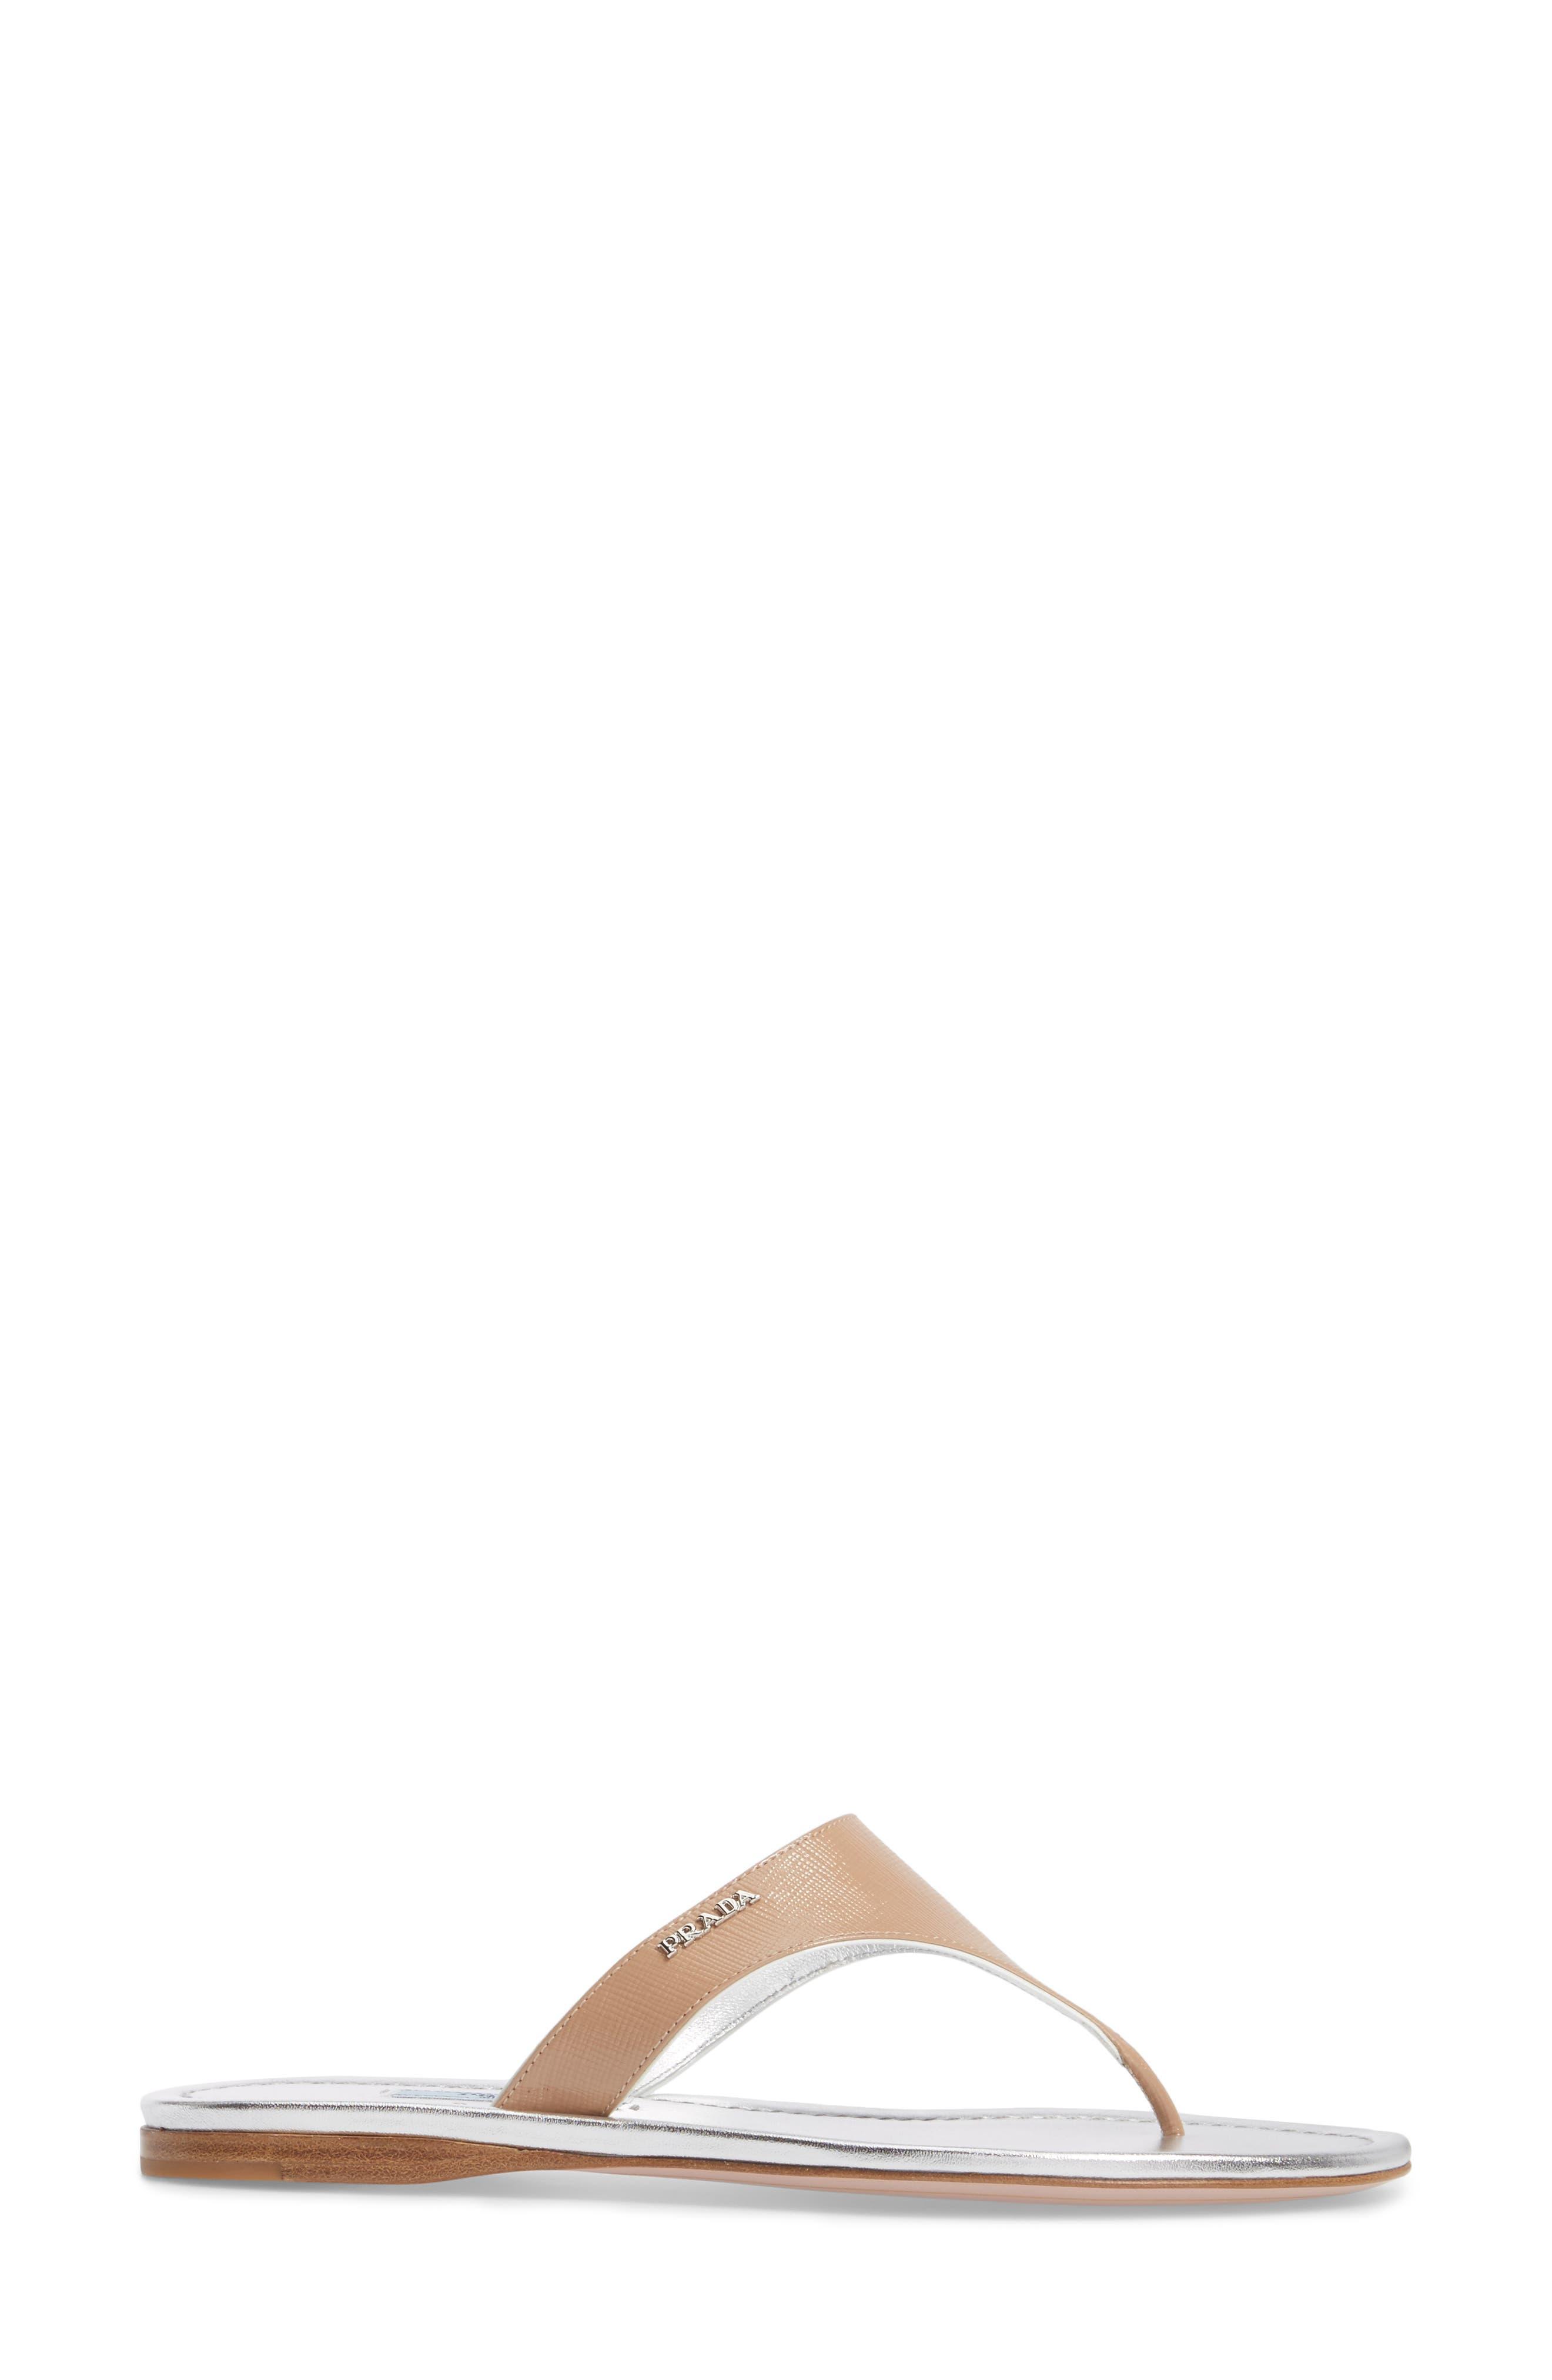 Thong Sandal,                             Alternate thumbnail 3, color,                             Nude